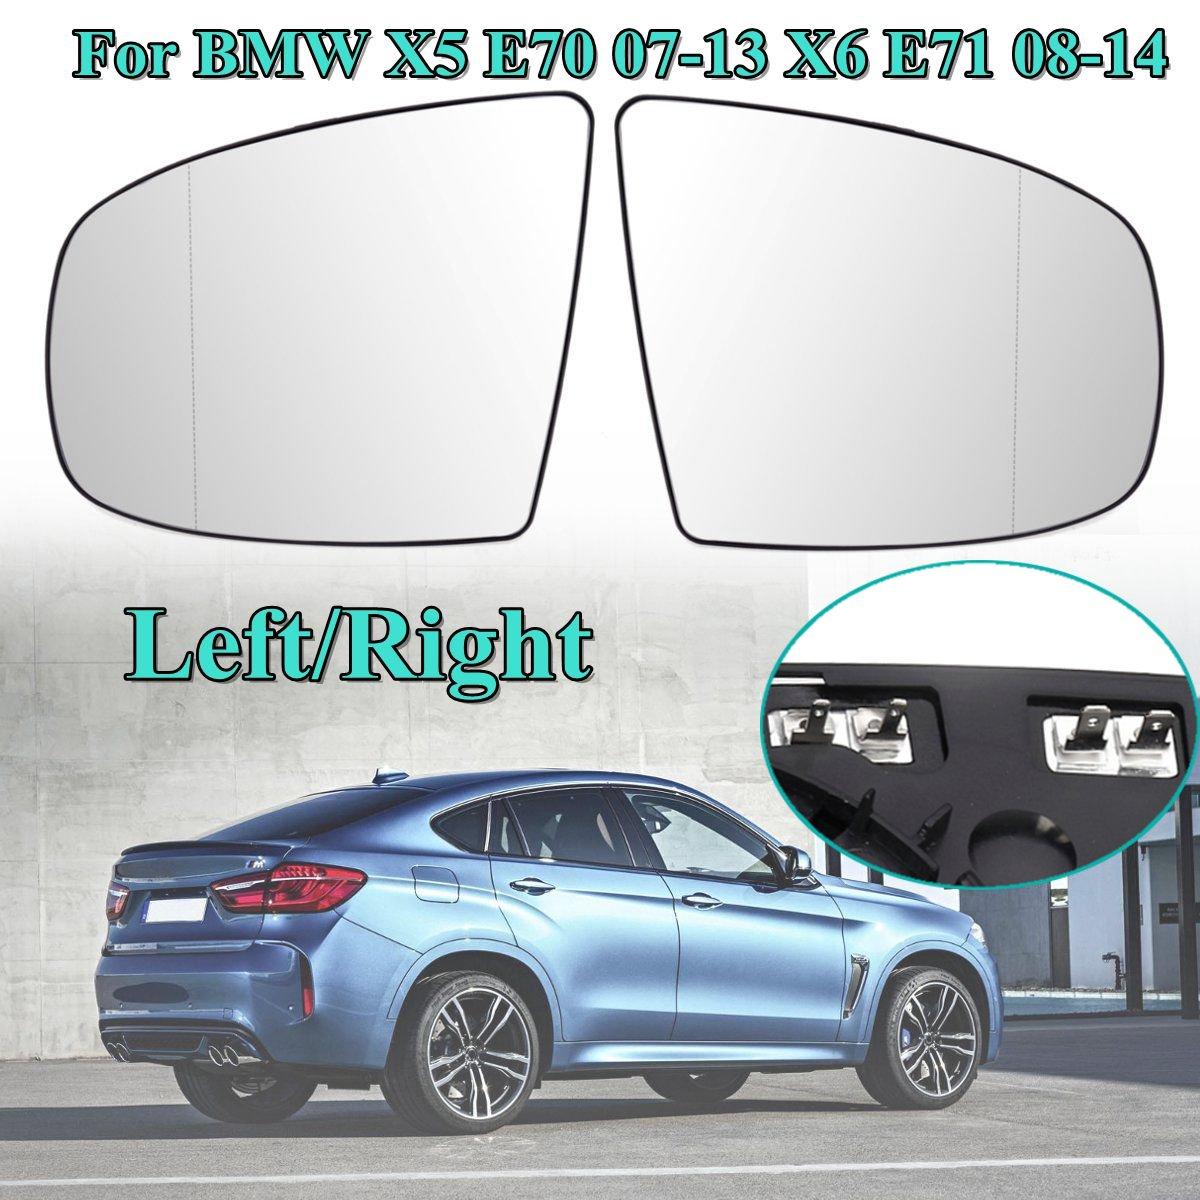 Wing Door Heated Mirror Glass Side Electric Heated Wing Mirror Glass For BMW X5 E70 07 11 X6 E71 08 14